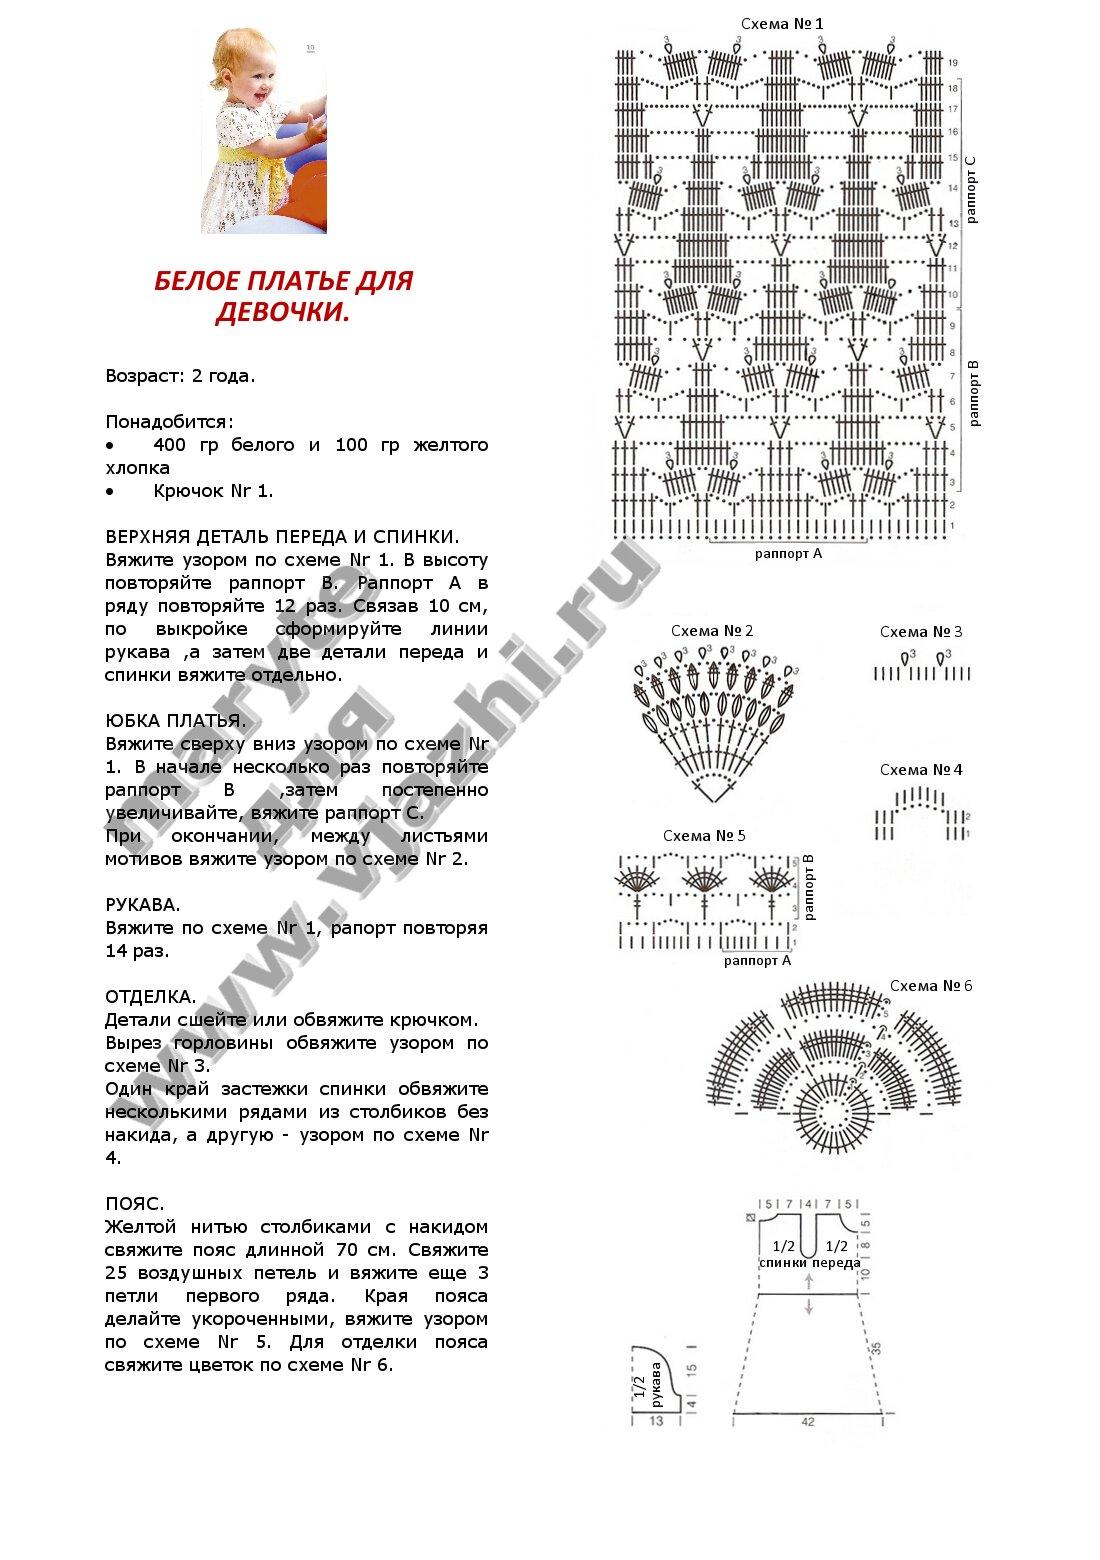 http://www.vjazhi.ru/images/stories/detyam/dress_balta/balta_p1.jpg